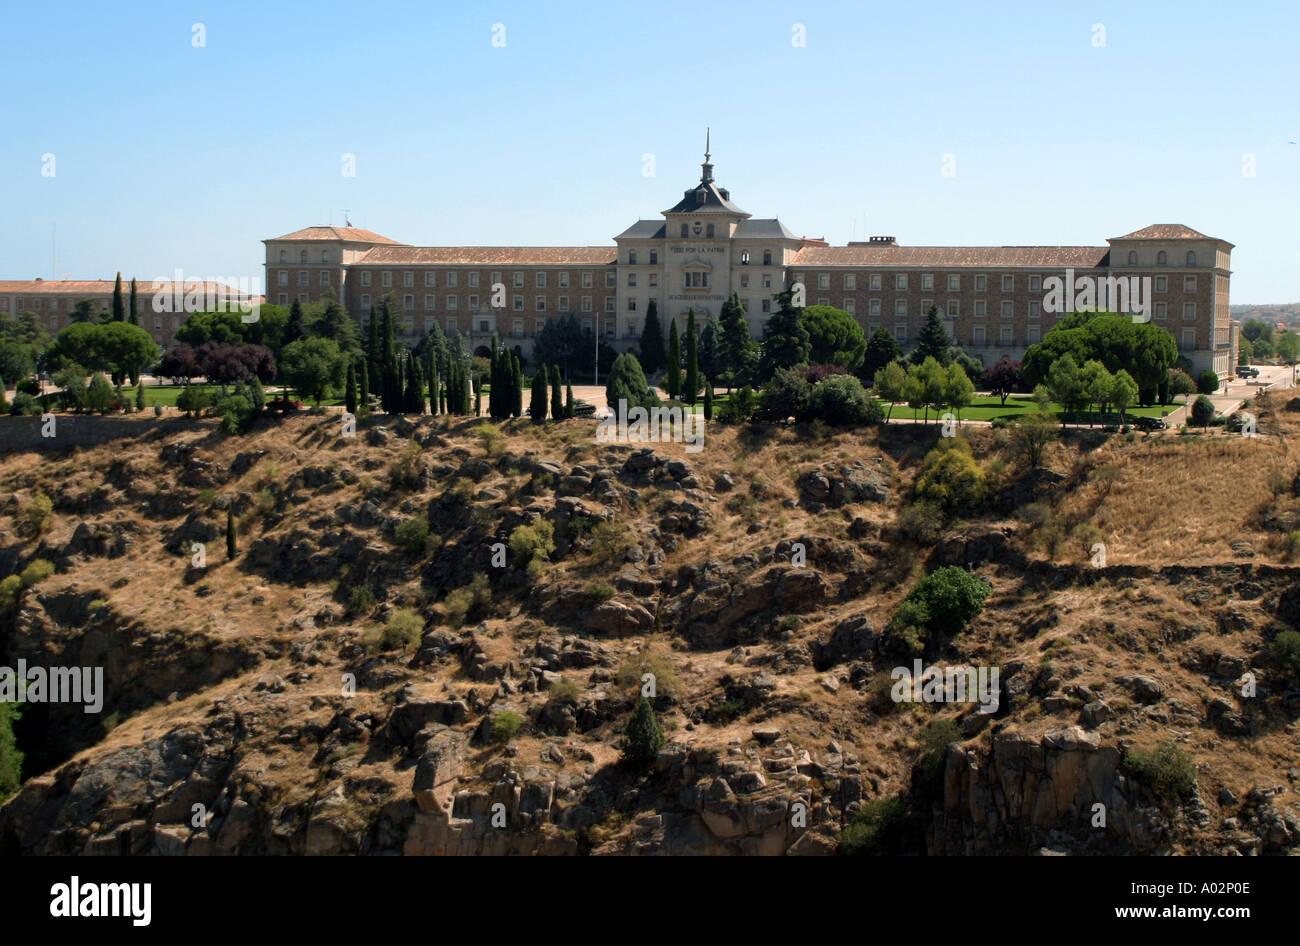 Spain Toledo Castilla la Mancha View of Academia De Infanteria Infantry Academy from Alcazar - Stock Image